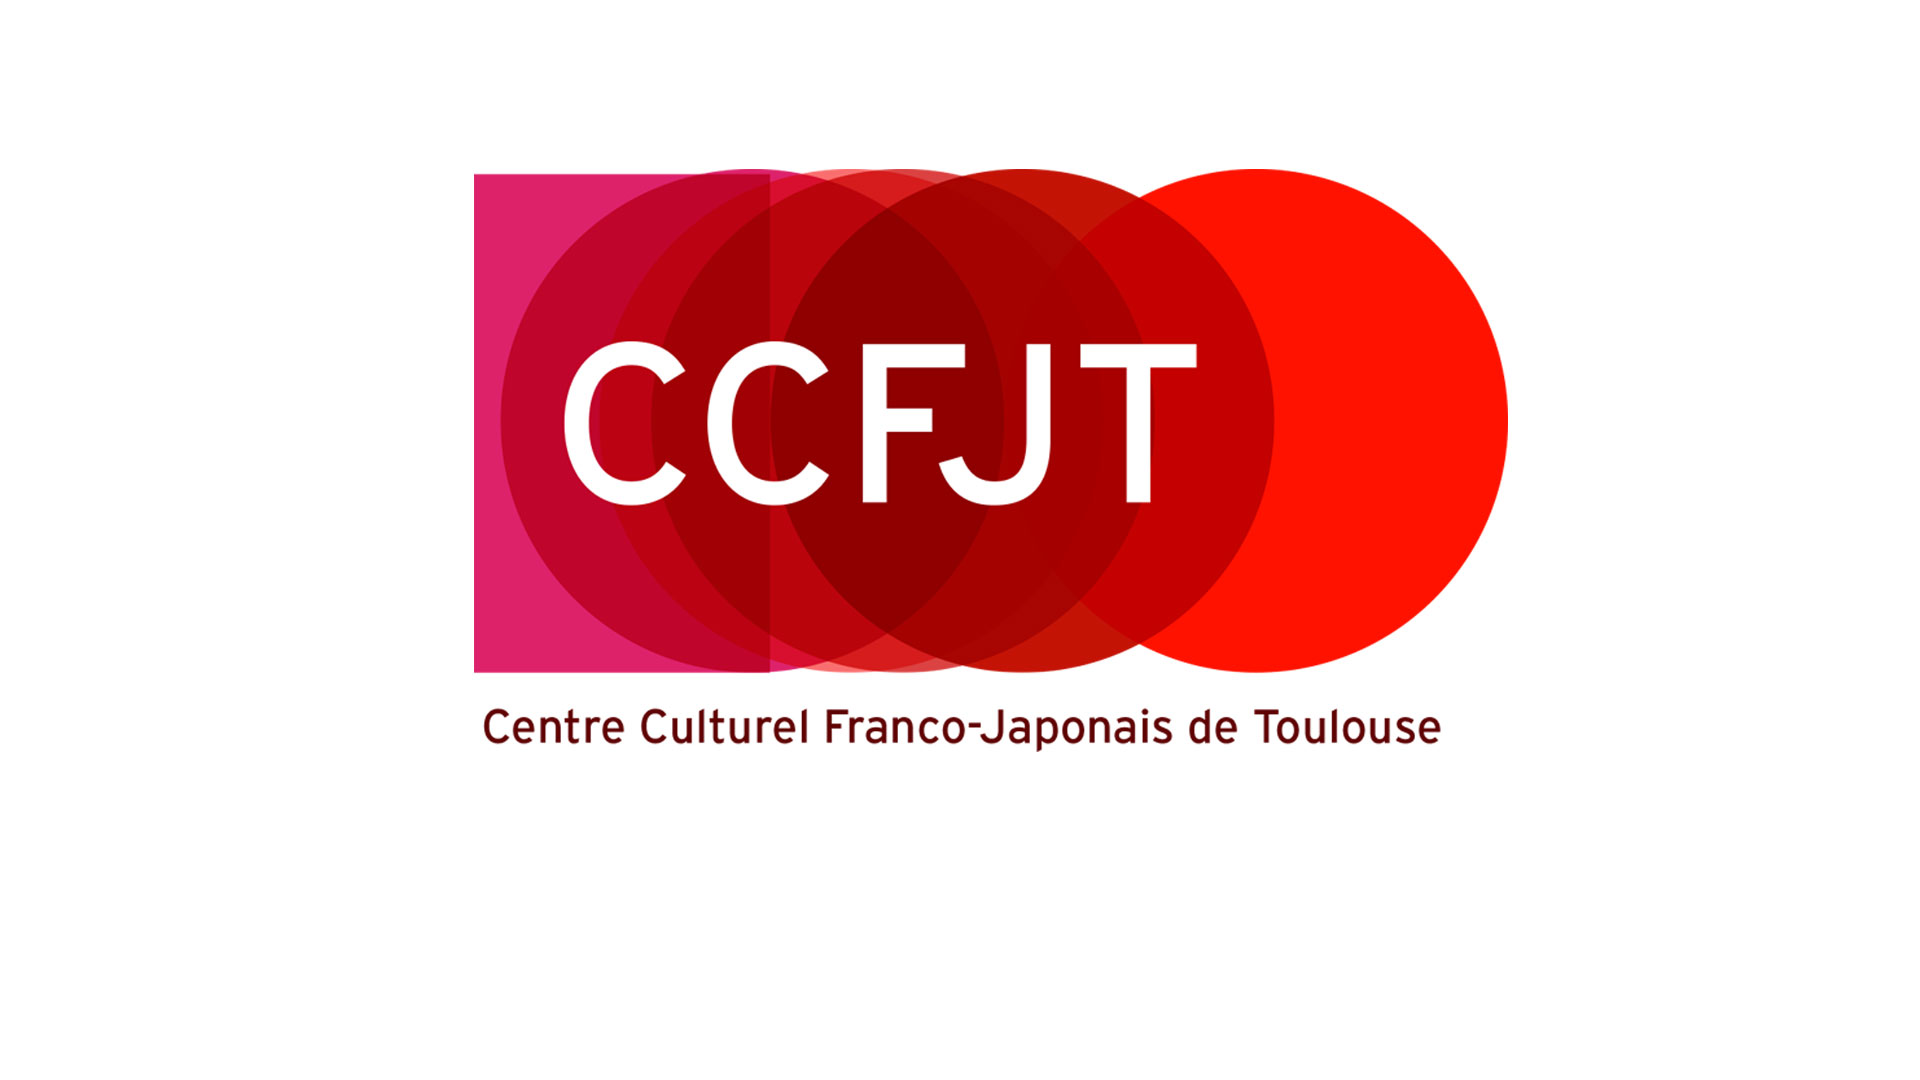 logo ccfjt - clémence devienne